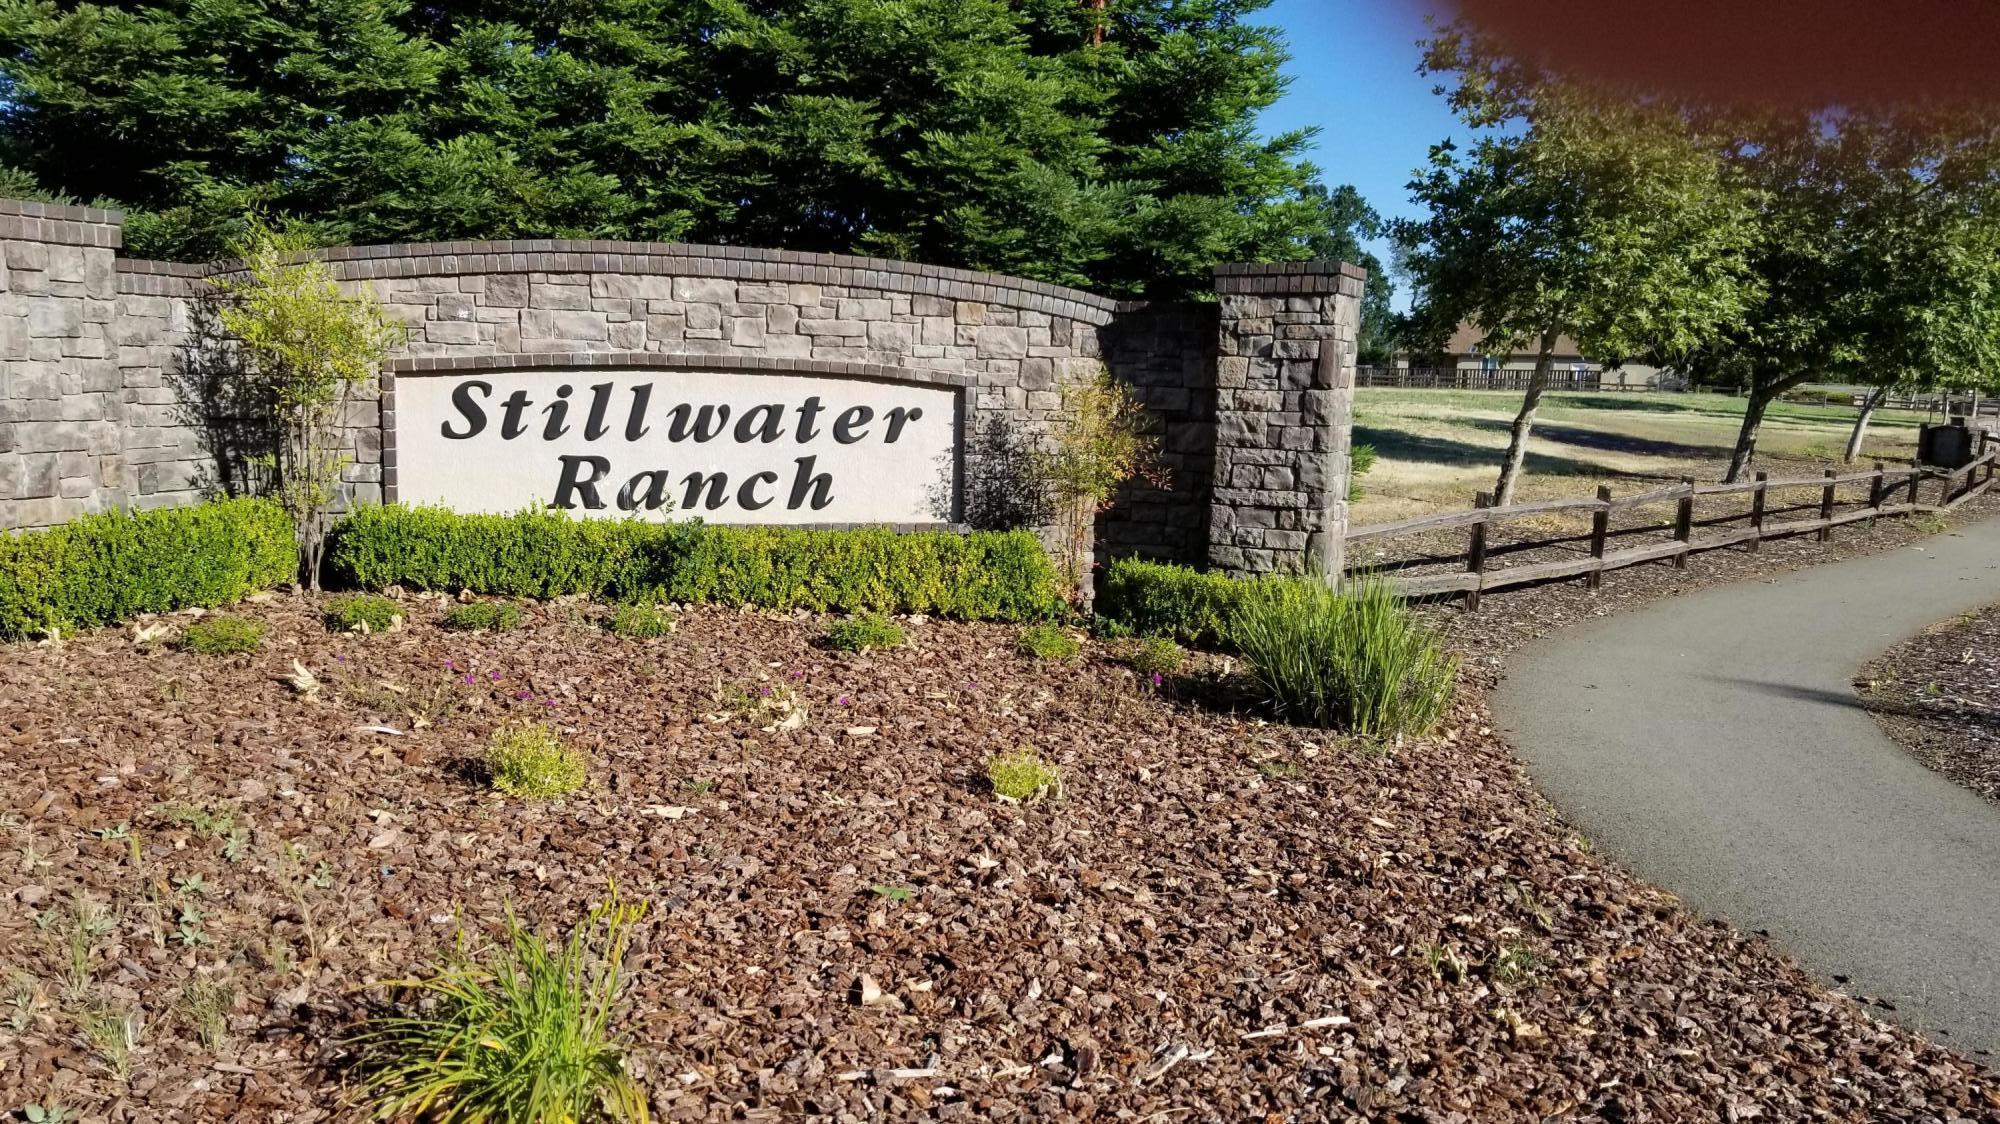 Lot 4,phase 3,stillwater Ranch, Redding CA 96003